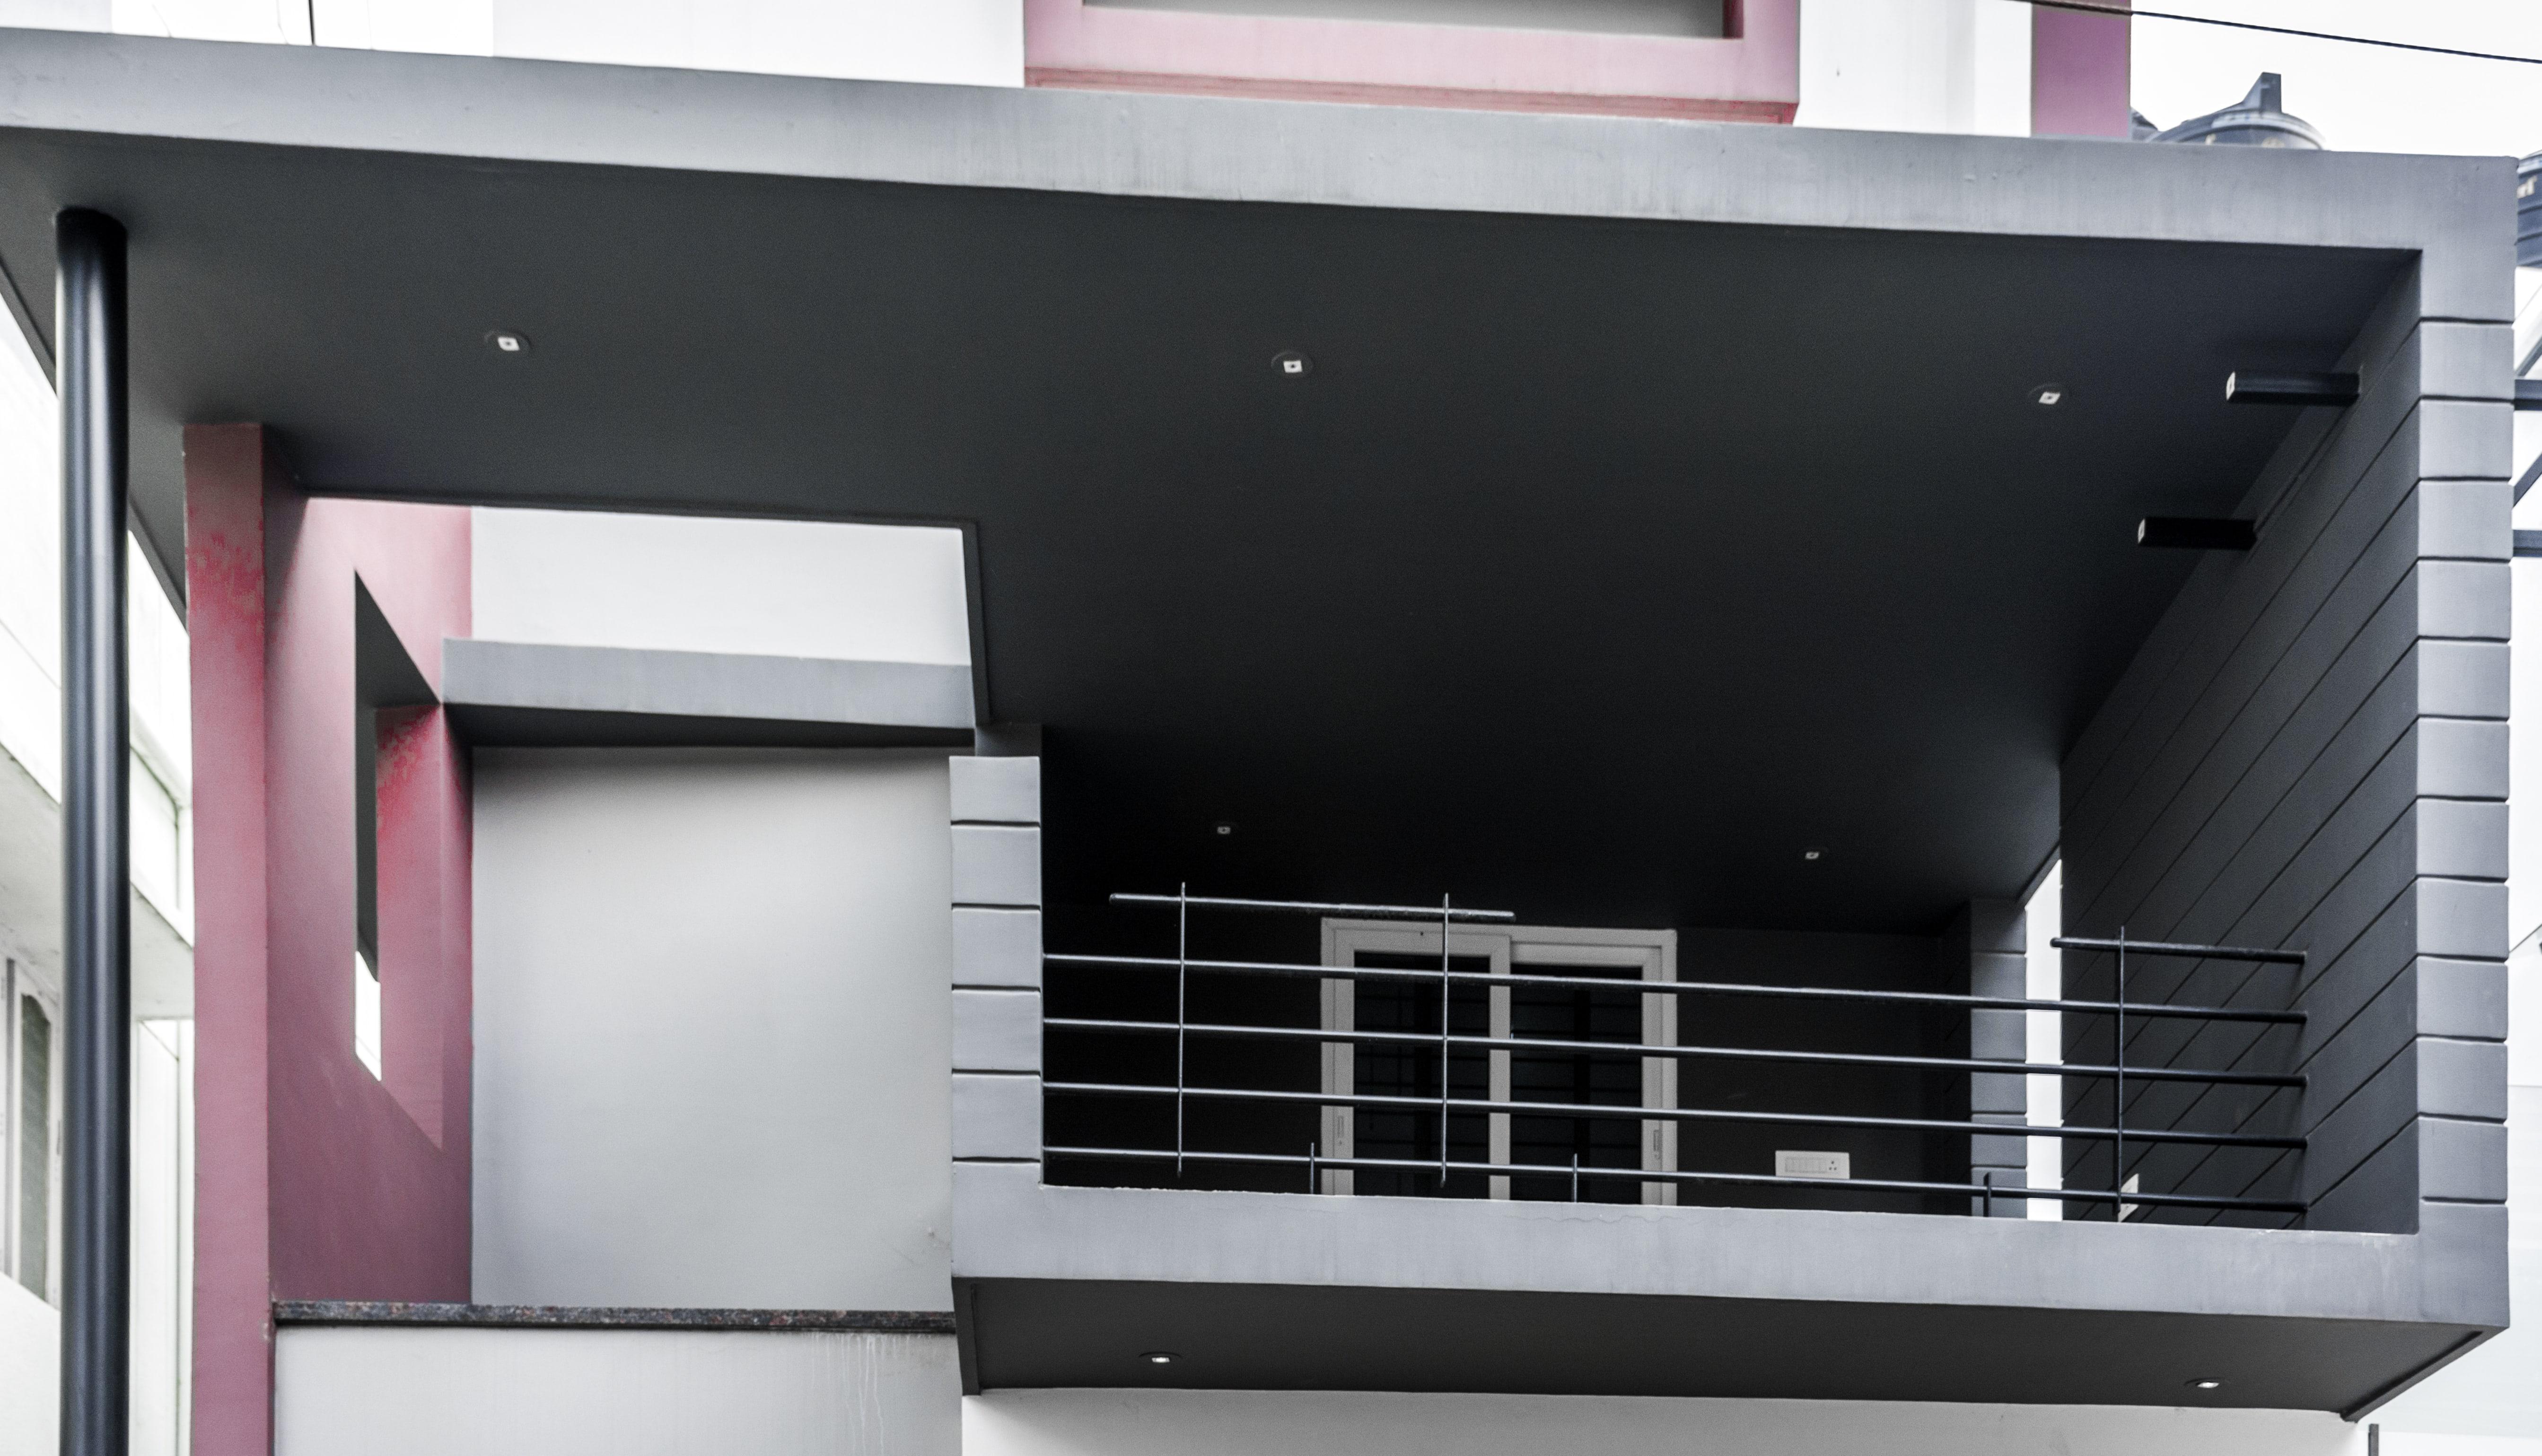 Exterior & Interior - Complete Home Design